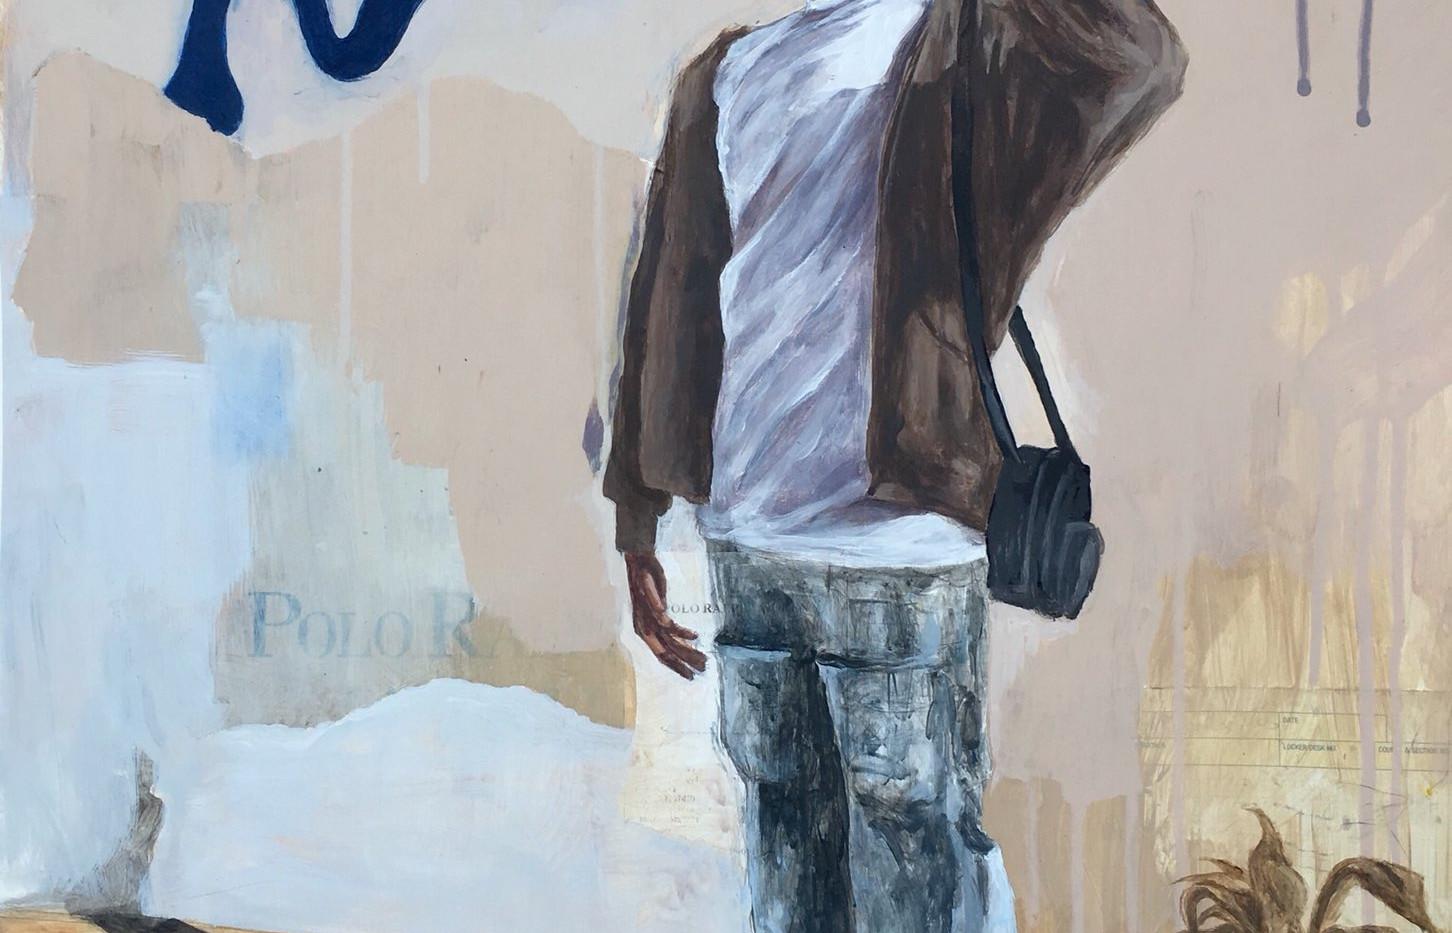 Abby Oyesam Major: Painting Title: Kwadjo Medium: Acrylic on Canvas Year: 2020 Dimensions: 18x24 Price: $1000